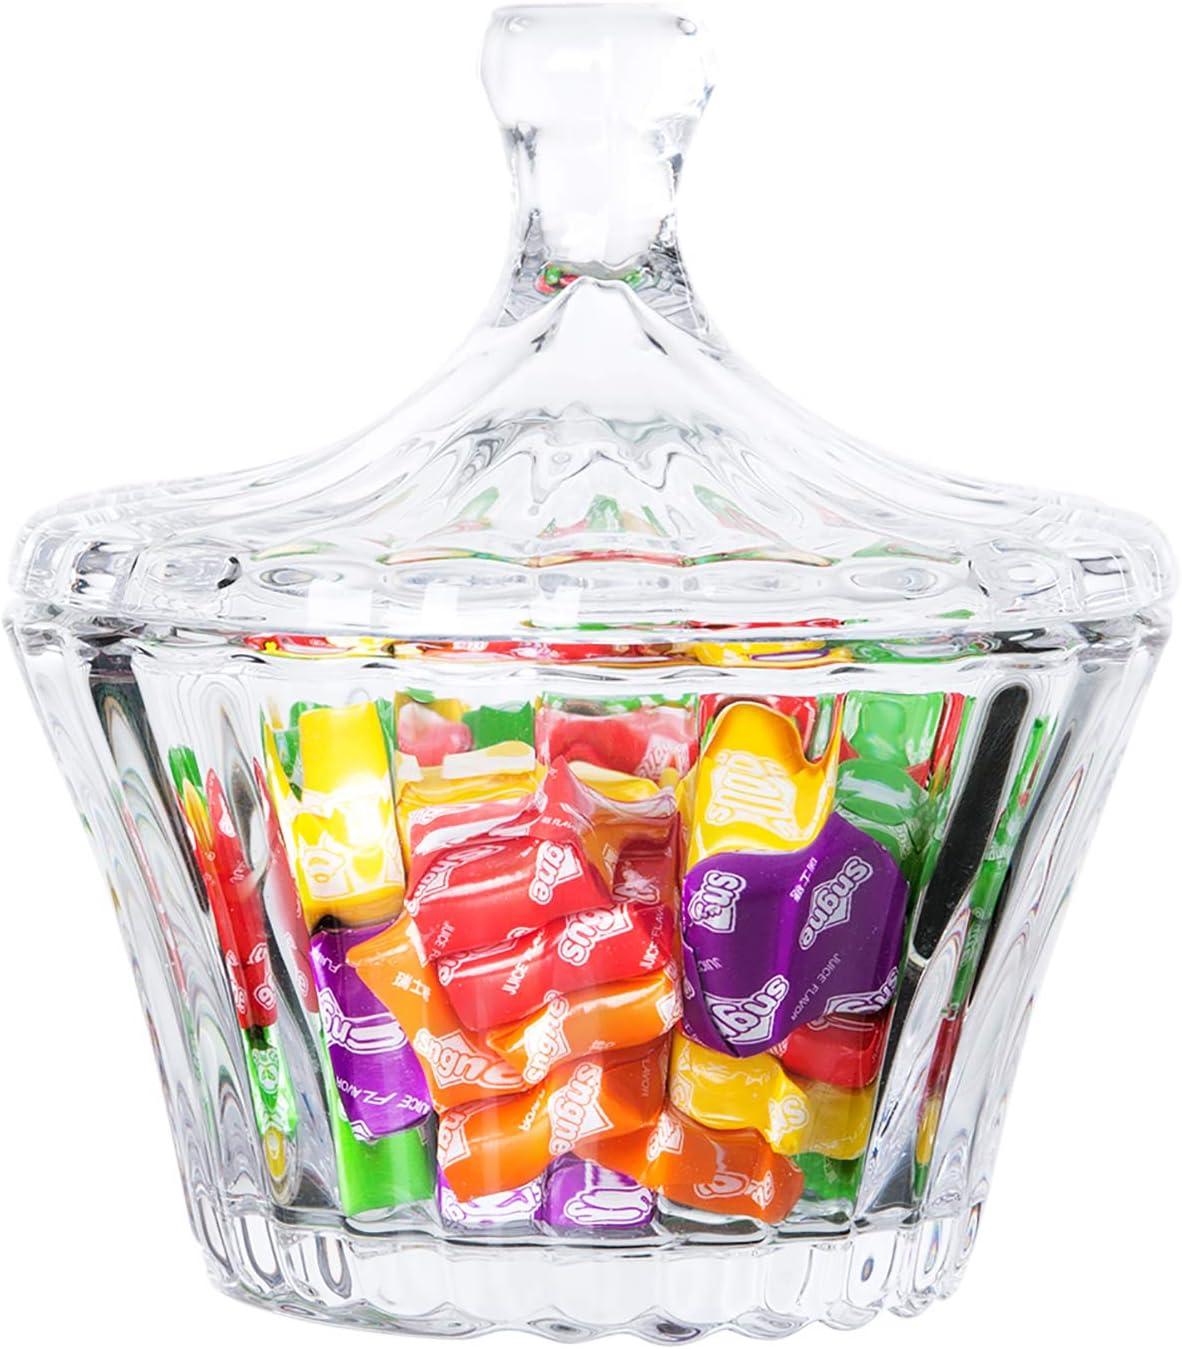 Diamond Star Candy Dish Small Decorative Glass Jar with Lid Candy Buffet Storage Jar (Clear)